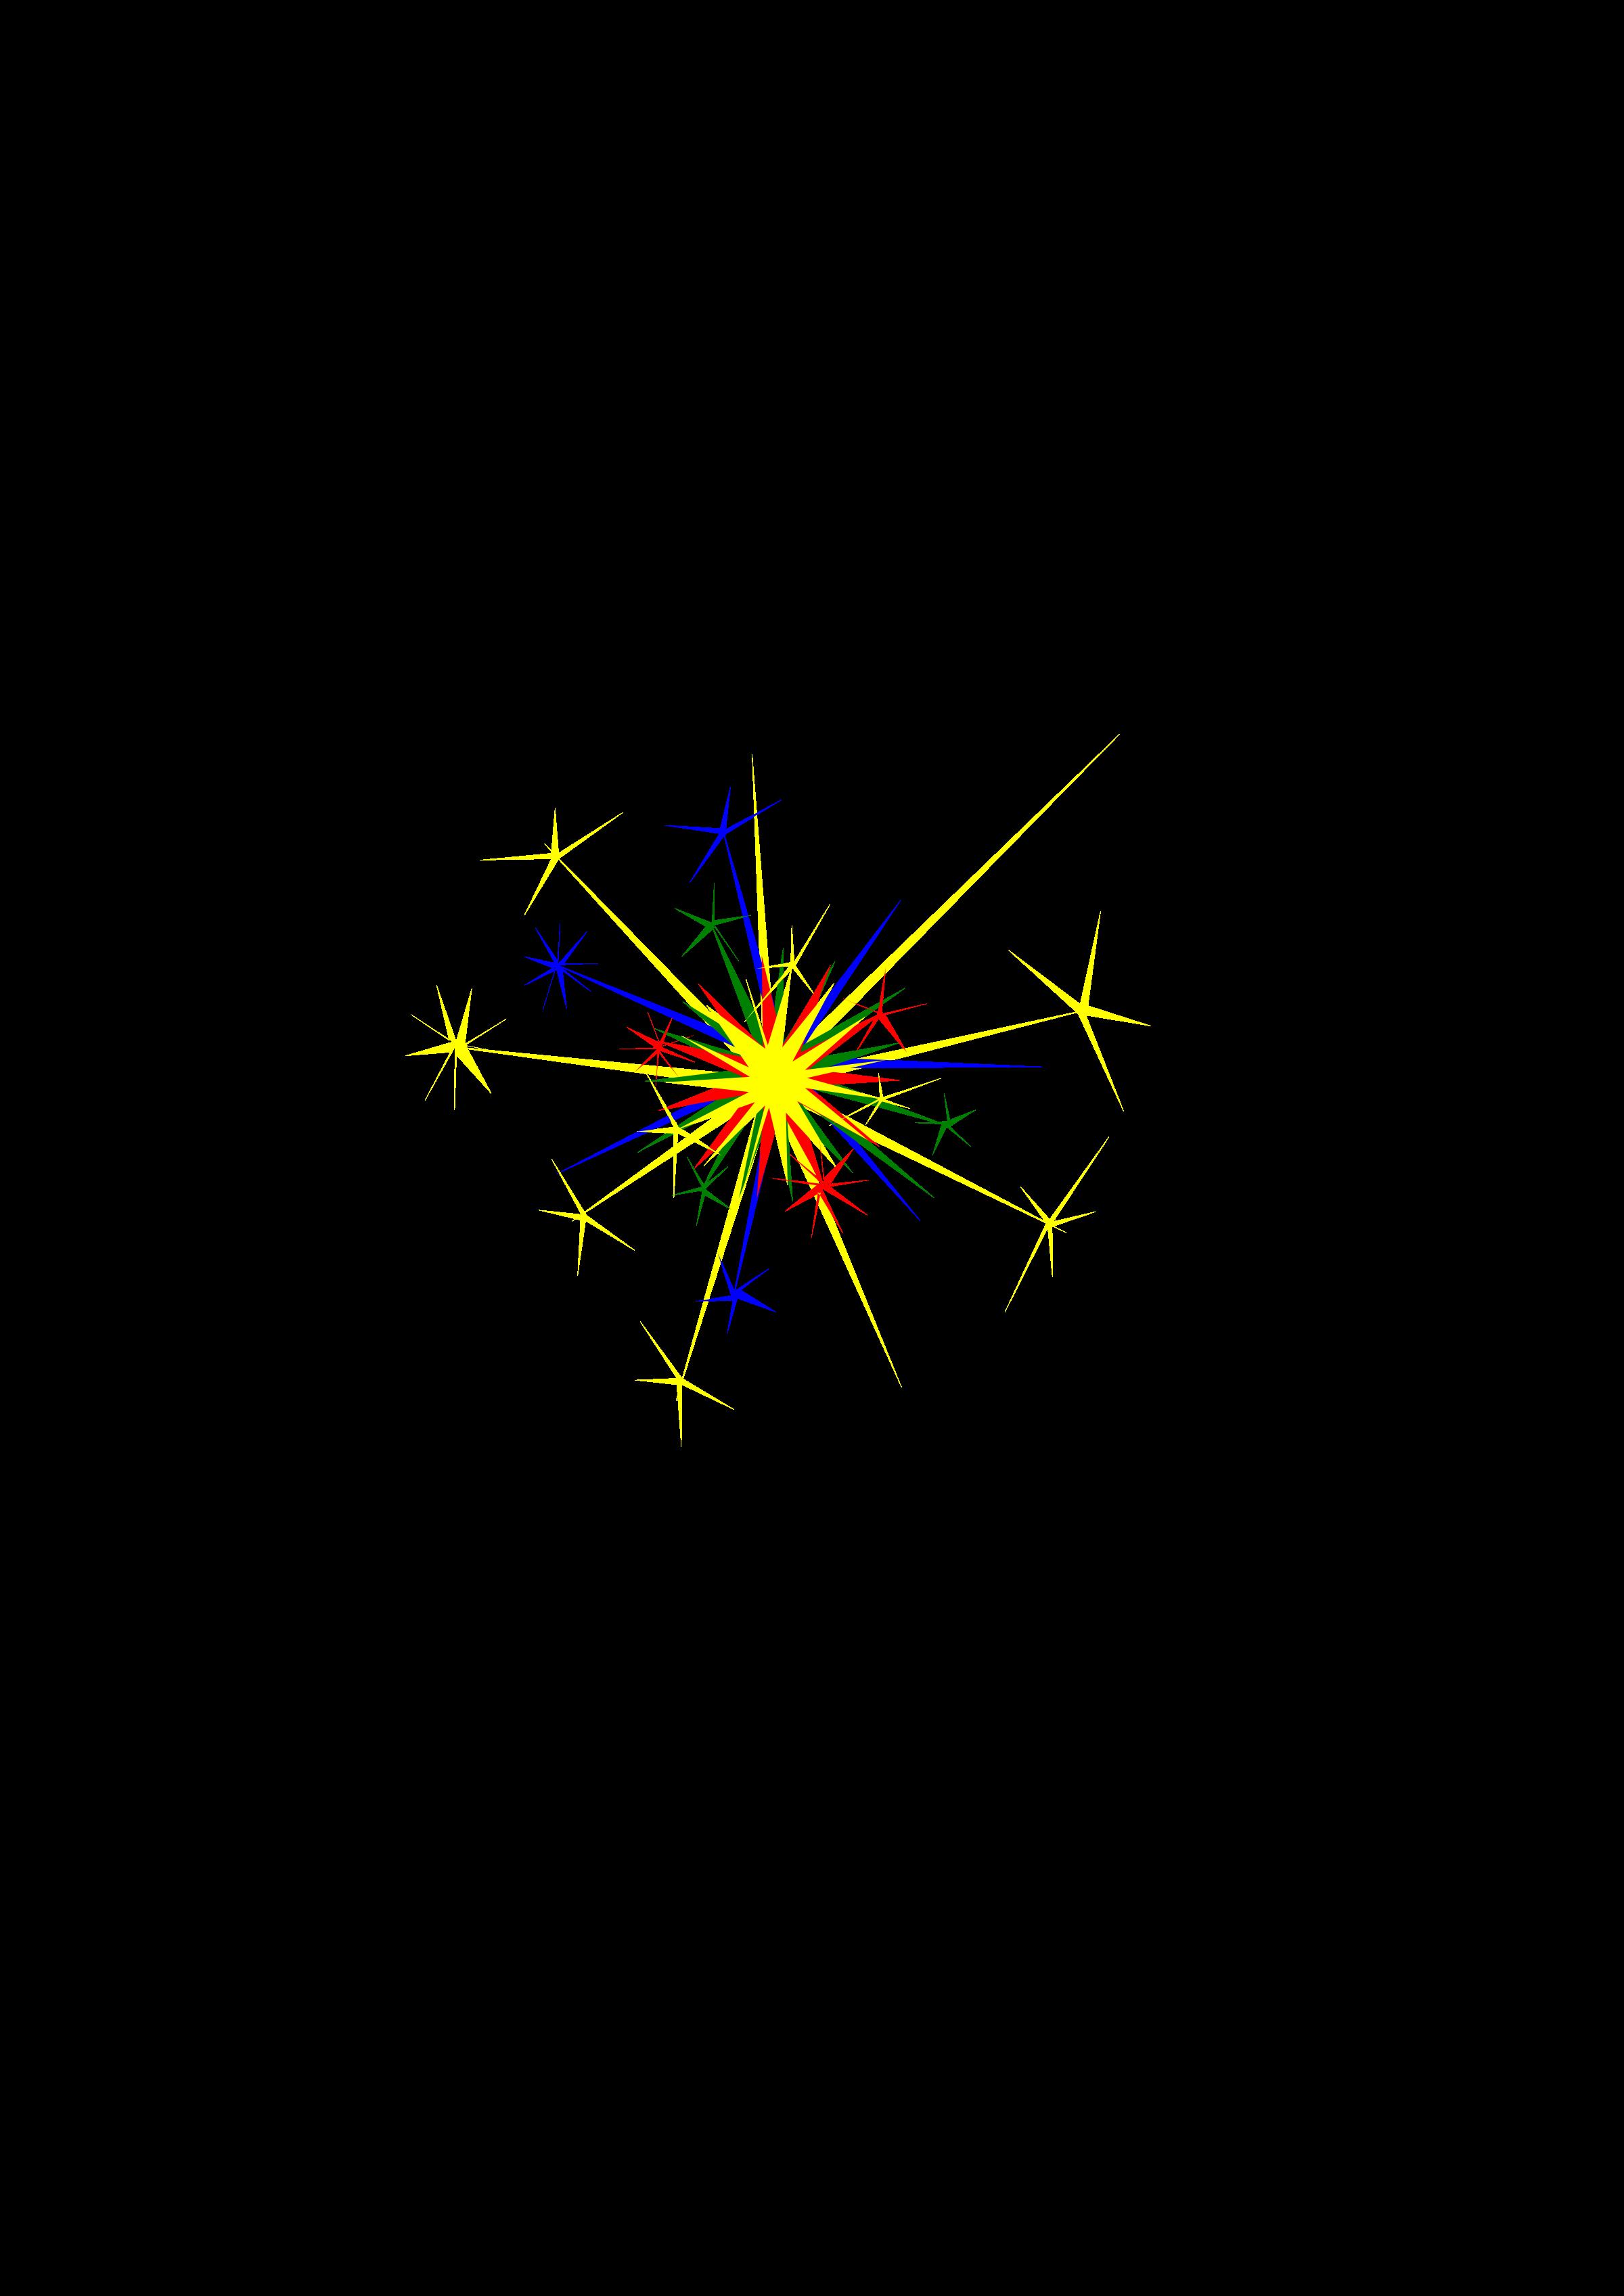 Sparkle clipart holy light. Sparks sparkly frames illustrations